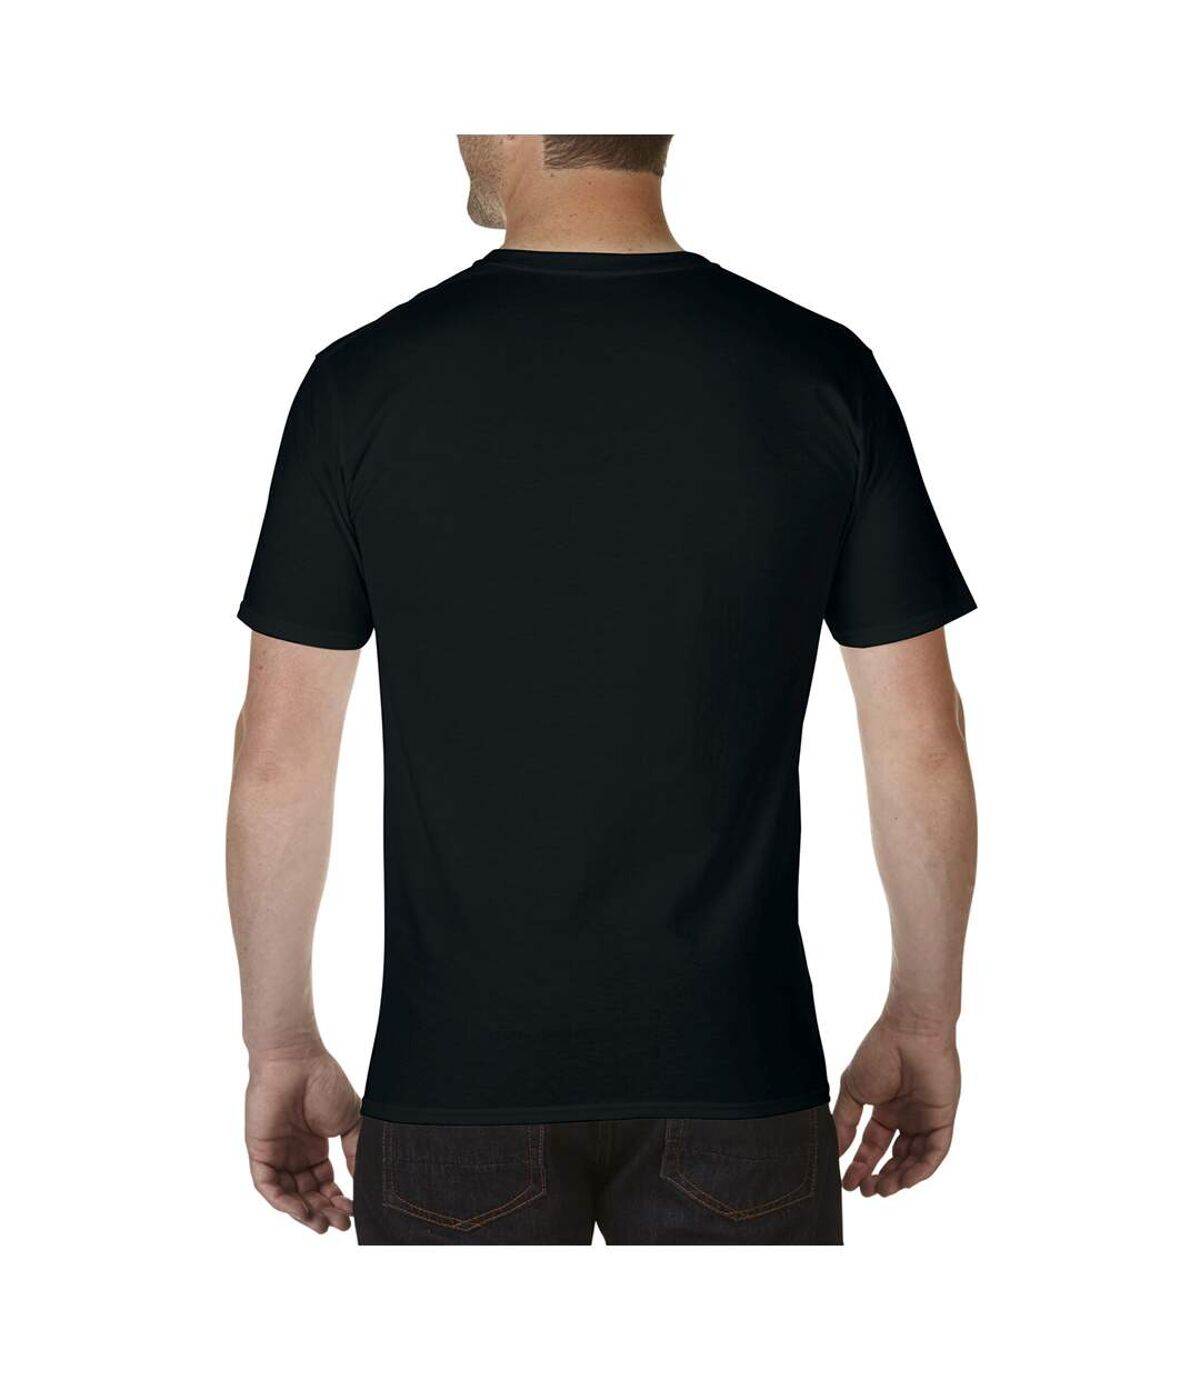 Gildan Mens Premium Cotton V Neck Short Sleeve T-Shirt (Black) - UTBC3483